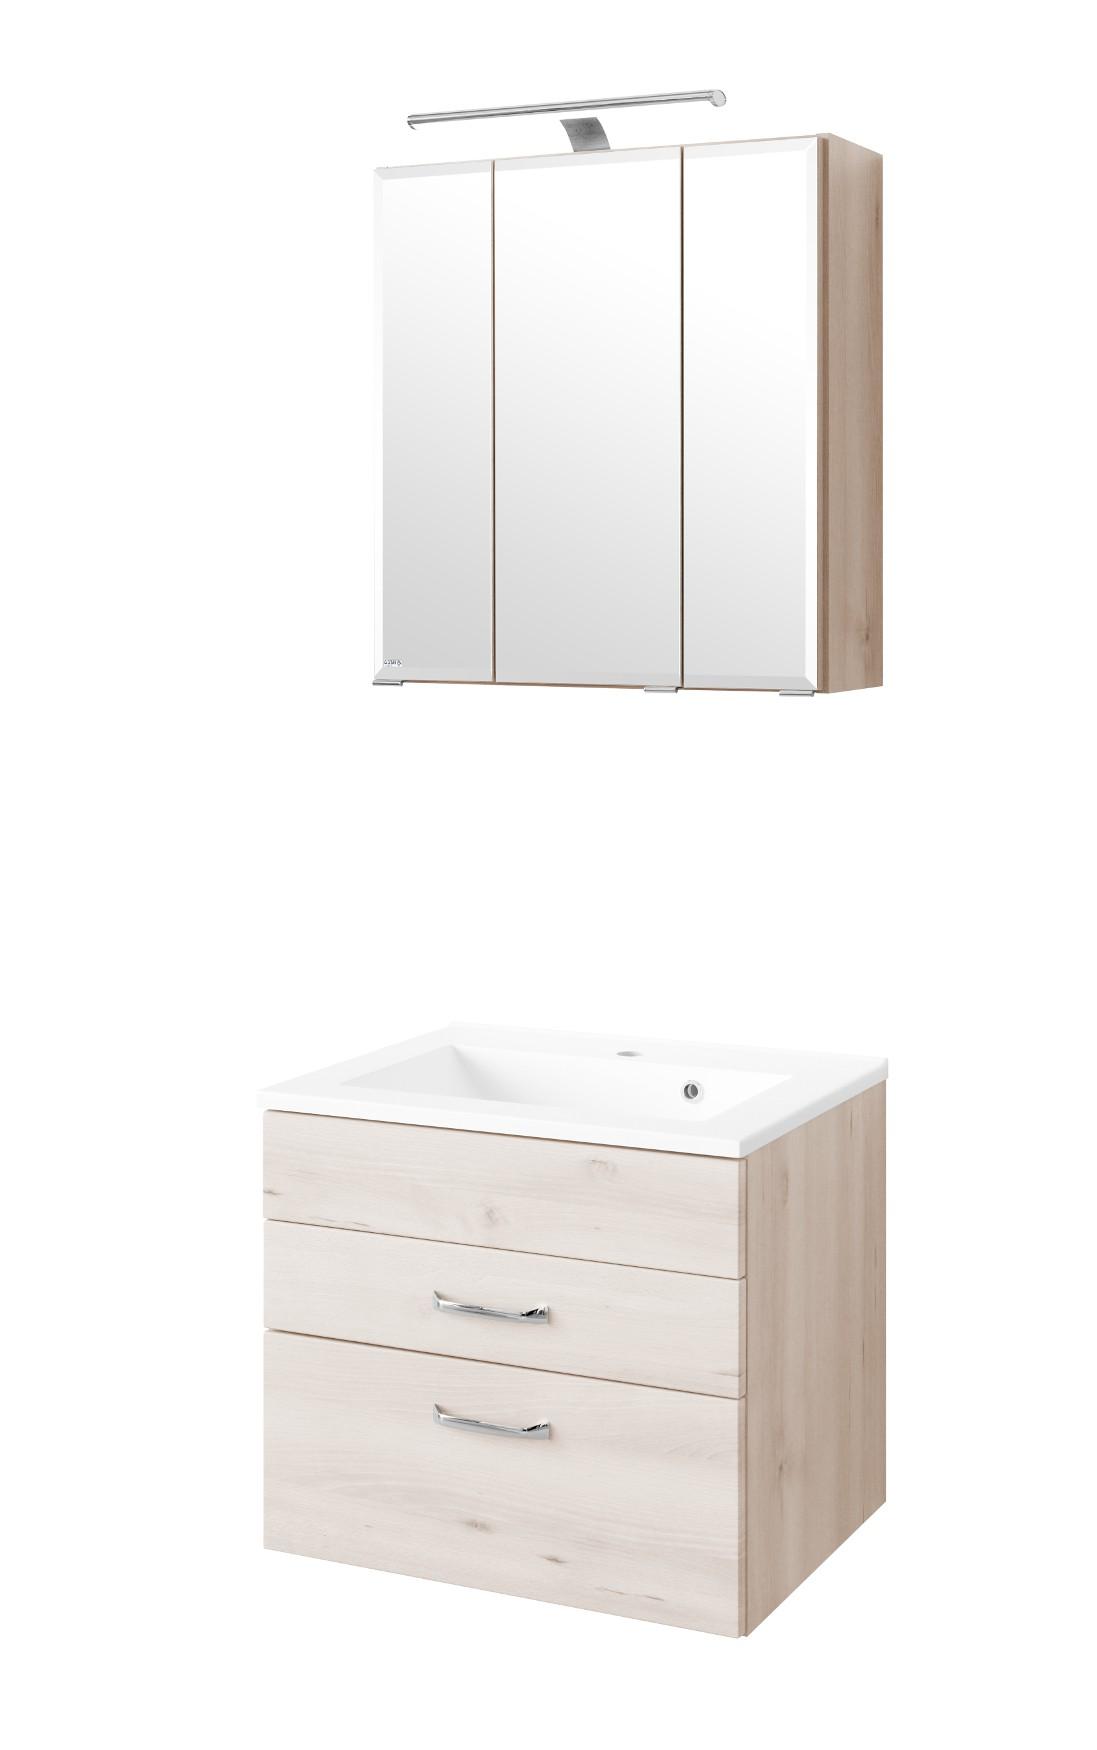 badezimmer set fontana waschtisch mit becken. Black Bedroom Furniture Sets. Home Design Ideas